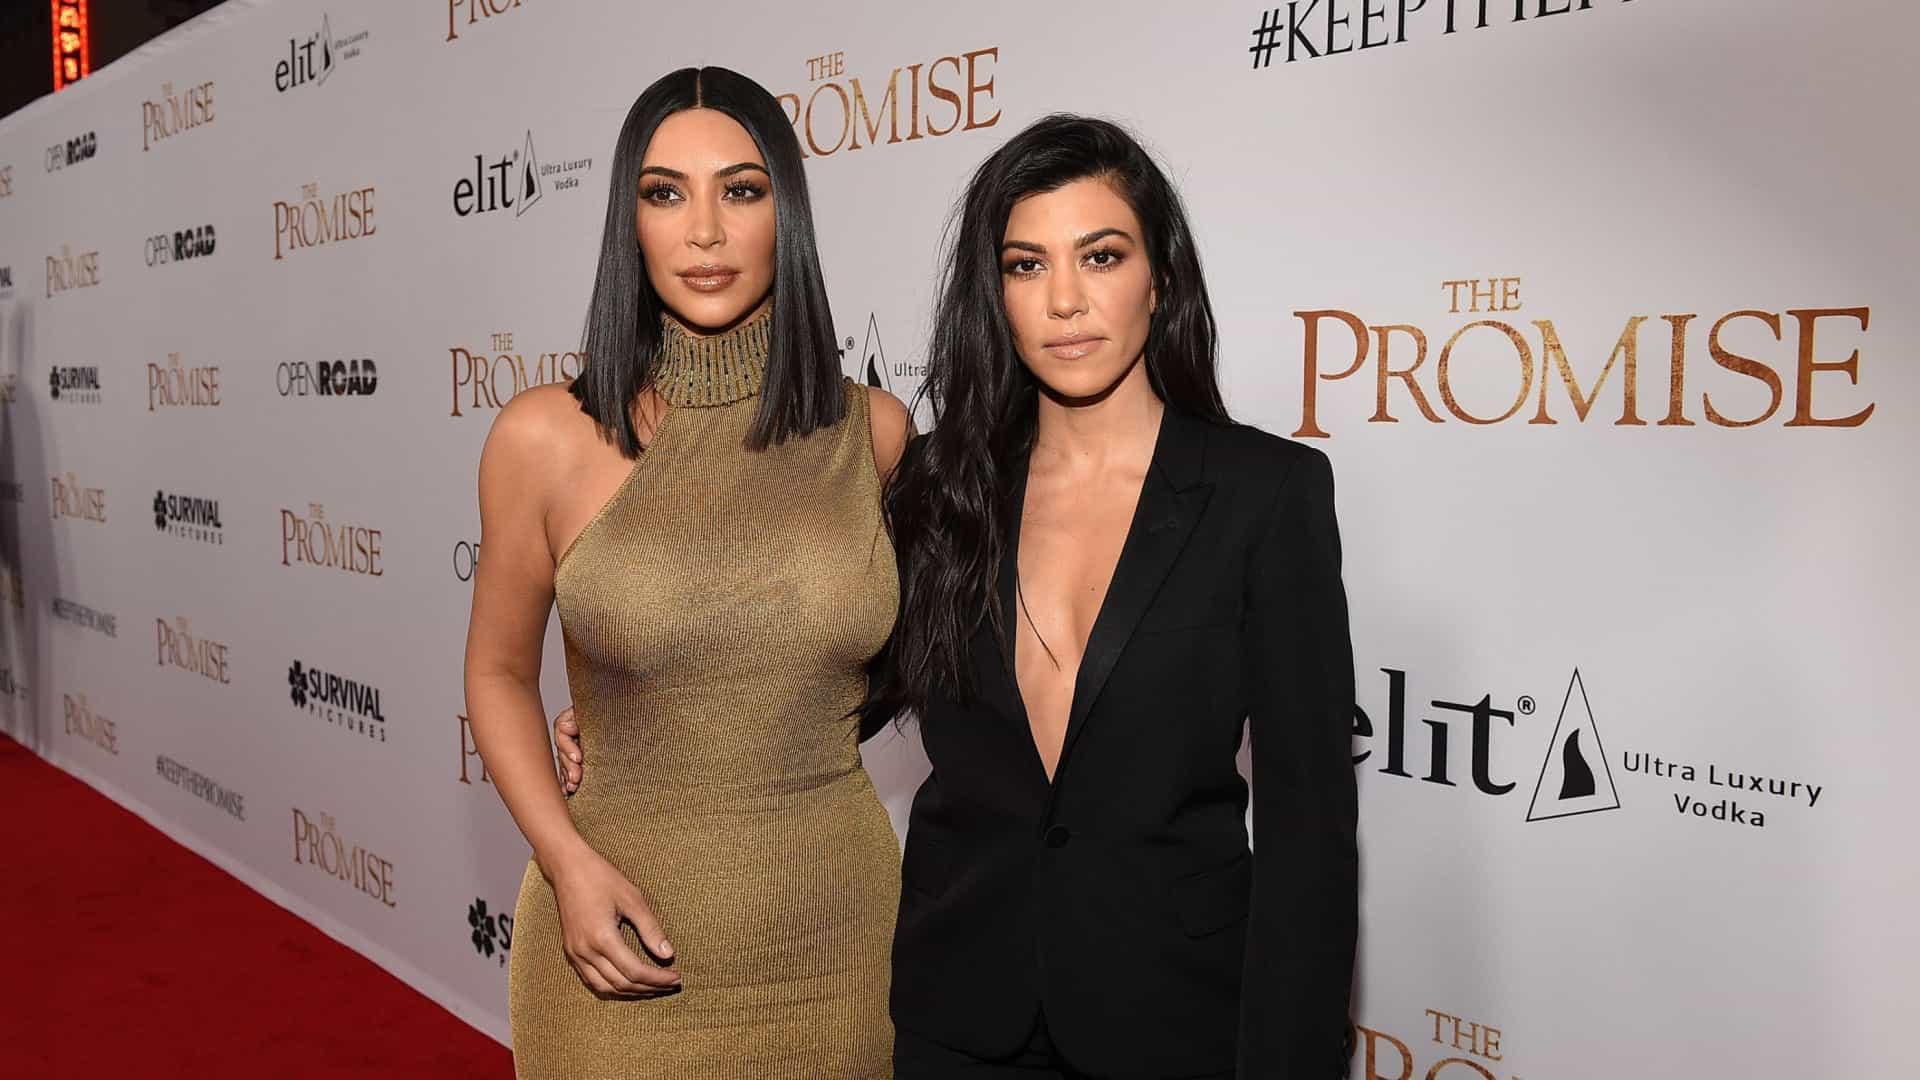 Durante briga, Kourtney Kardashian dá soco no rosto de Kim Kardashian (Foto: Reprodução)